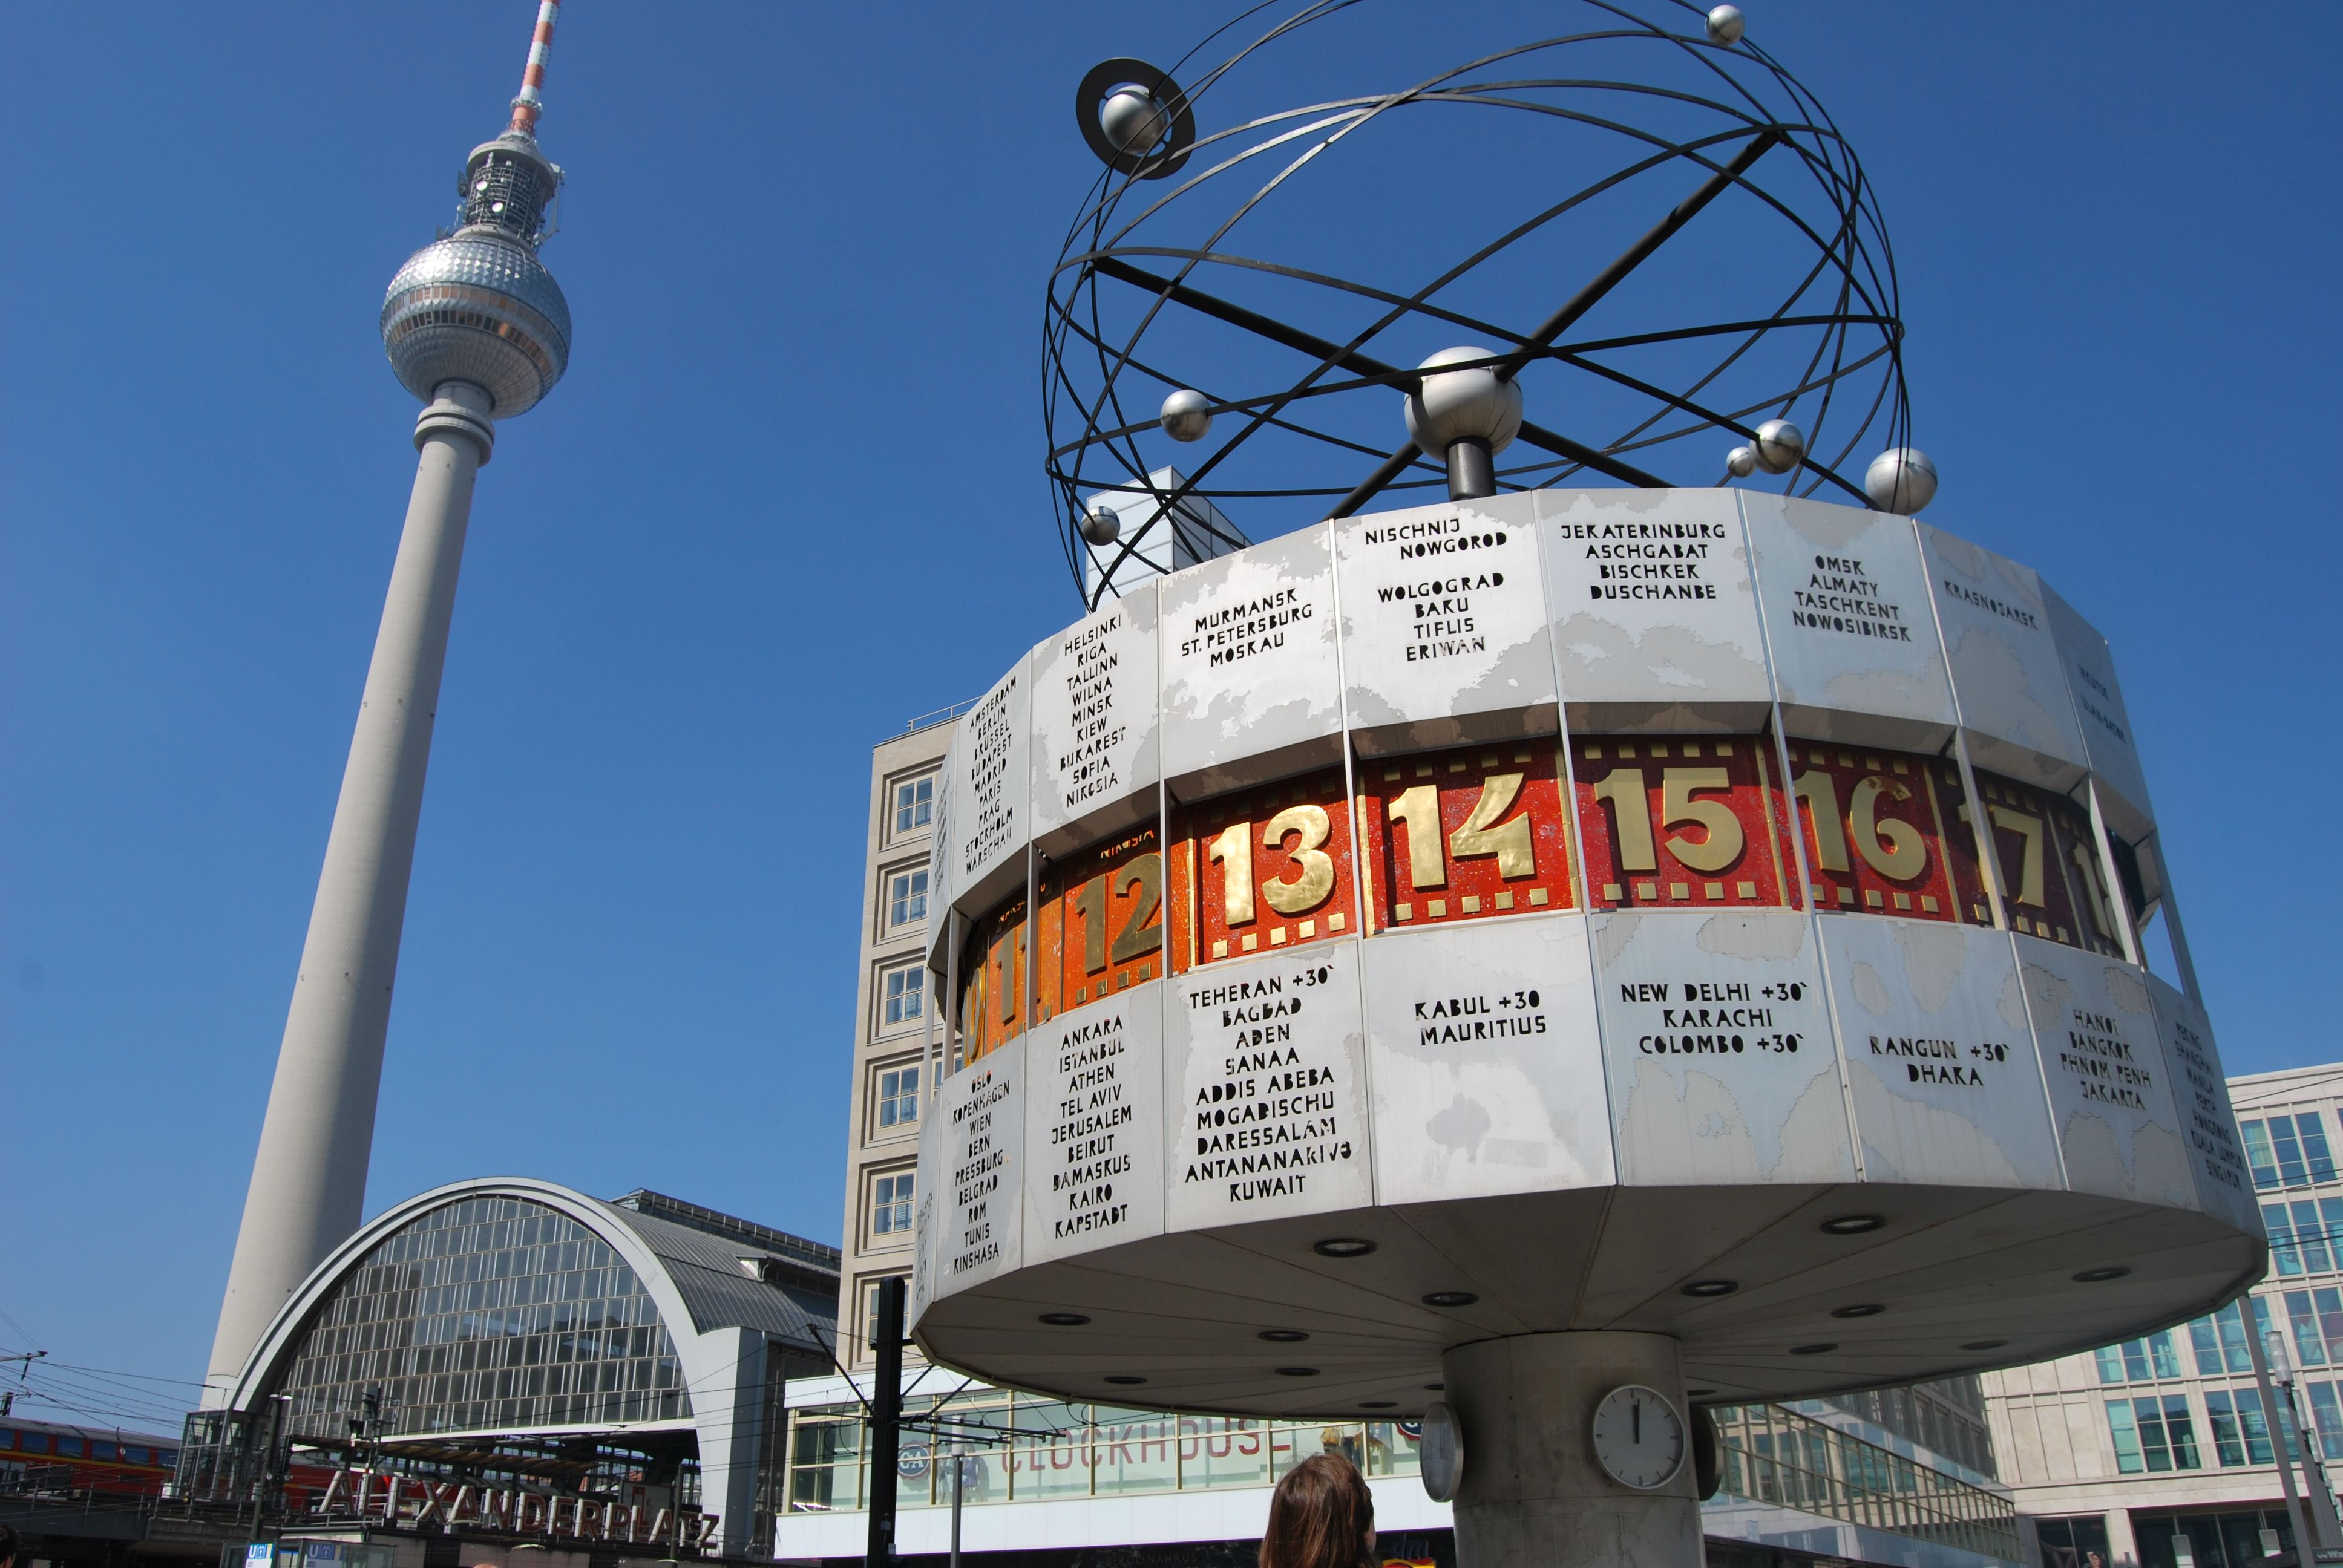 Alexanderplatz Berlin Germany Leaning Tower Of Pisa Life Moves Pretty Fast Berlin